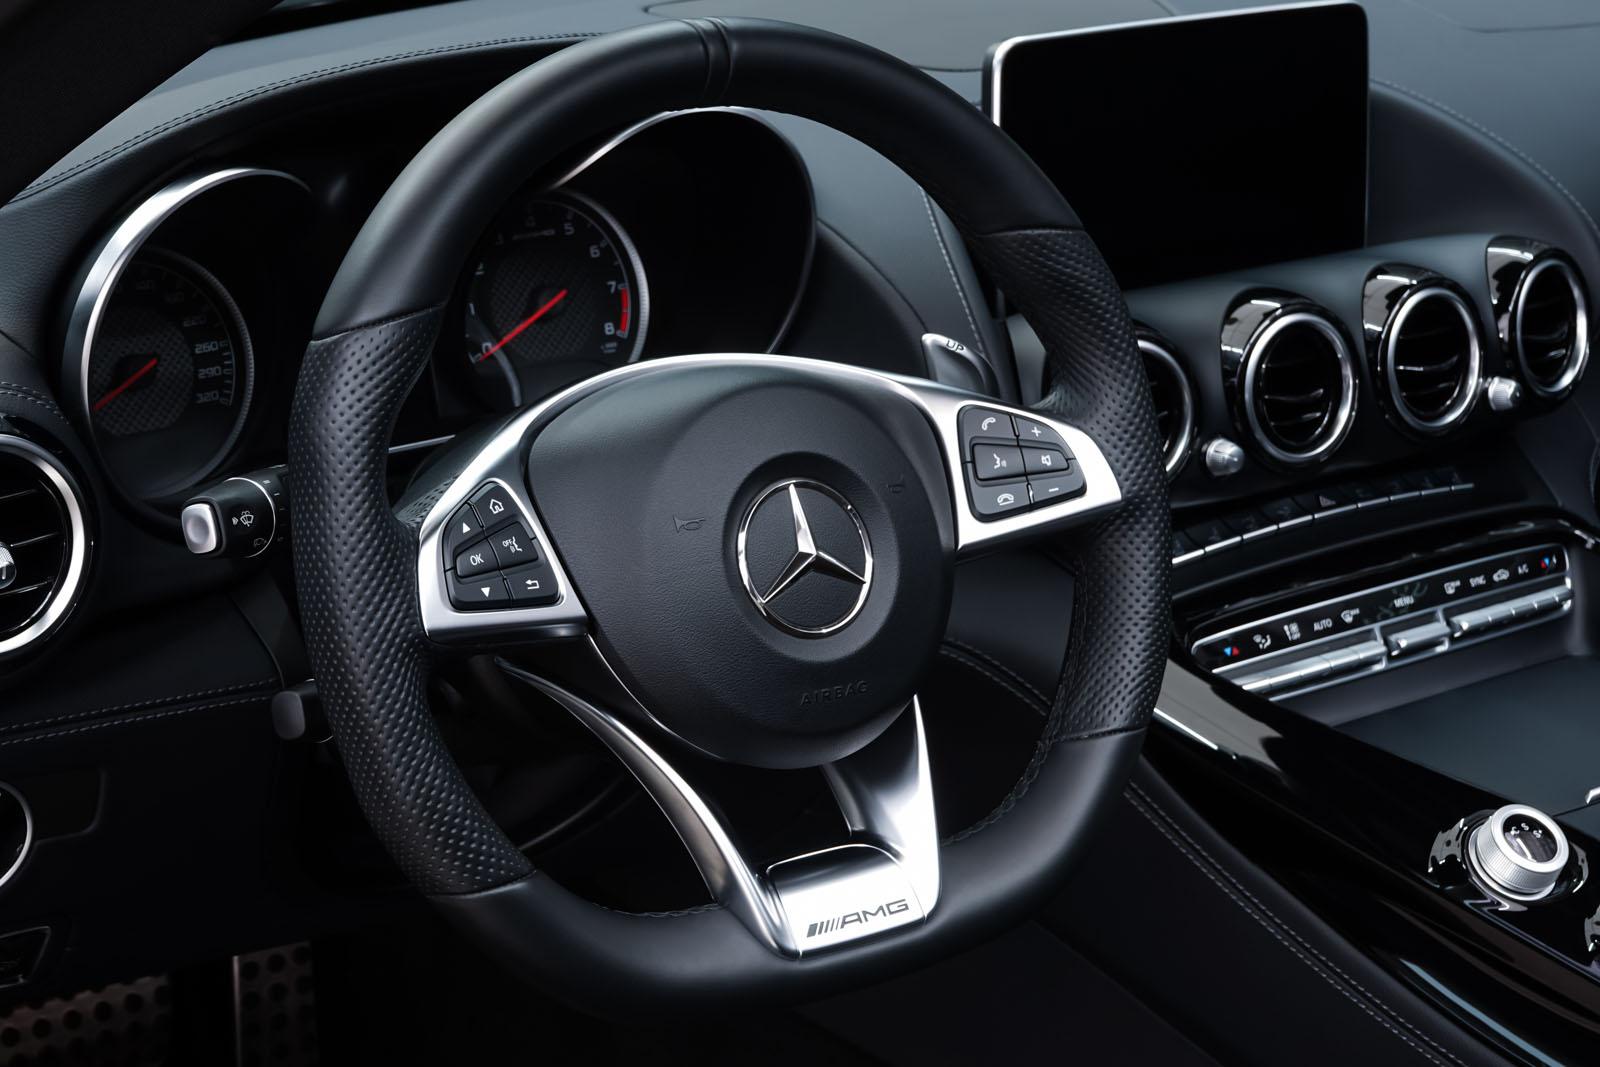 11Mercedes_Benz_AMG_GT_Roadster_Weiss_Schwarz_MB-9710_12_w